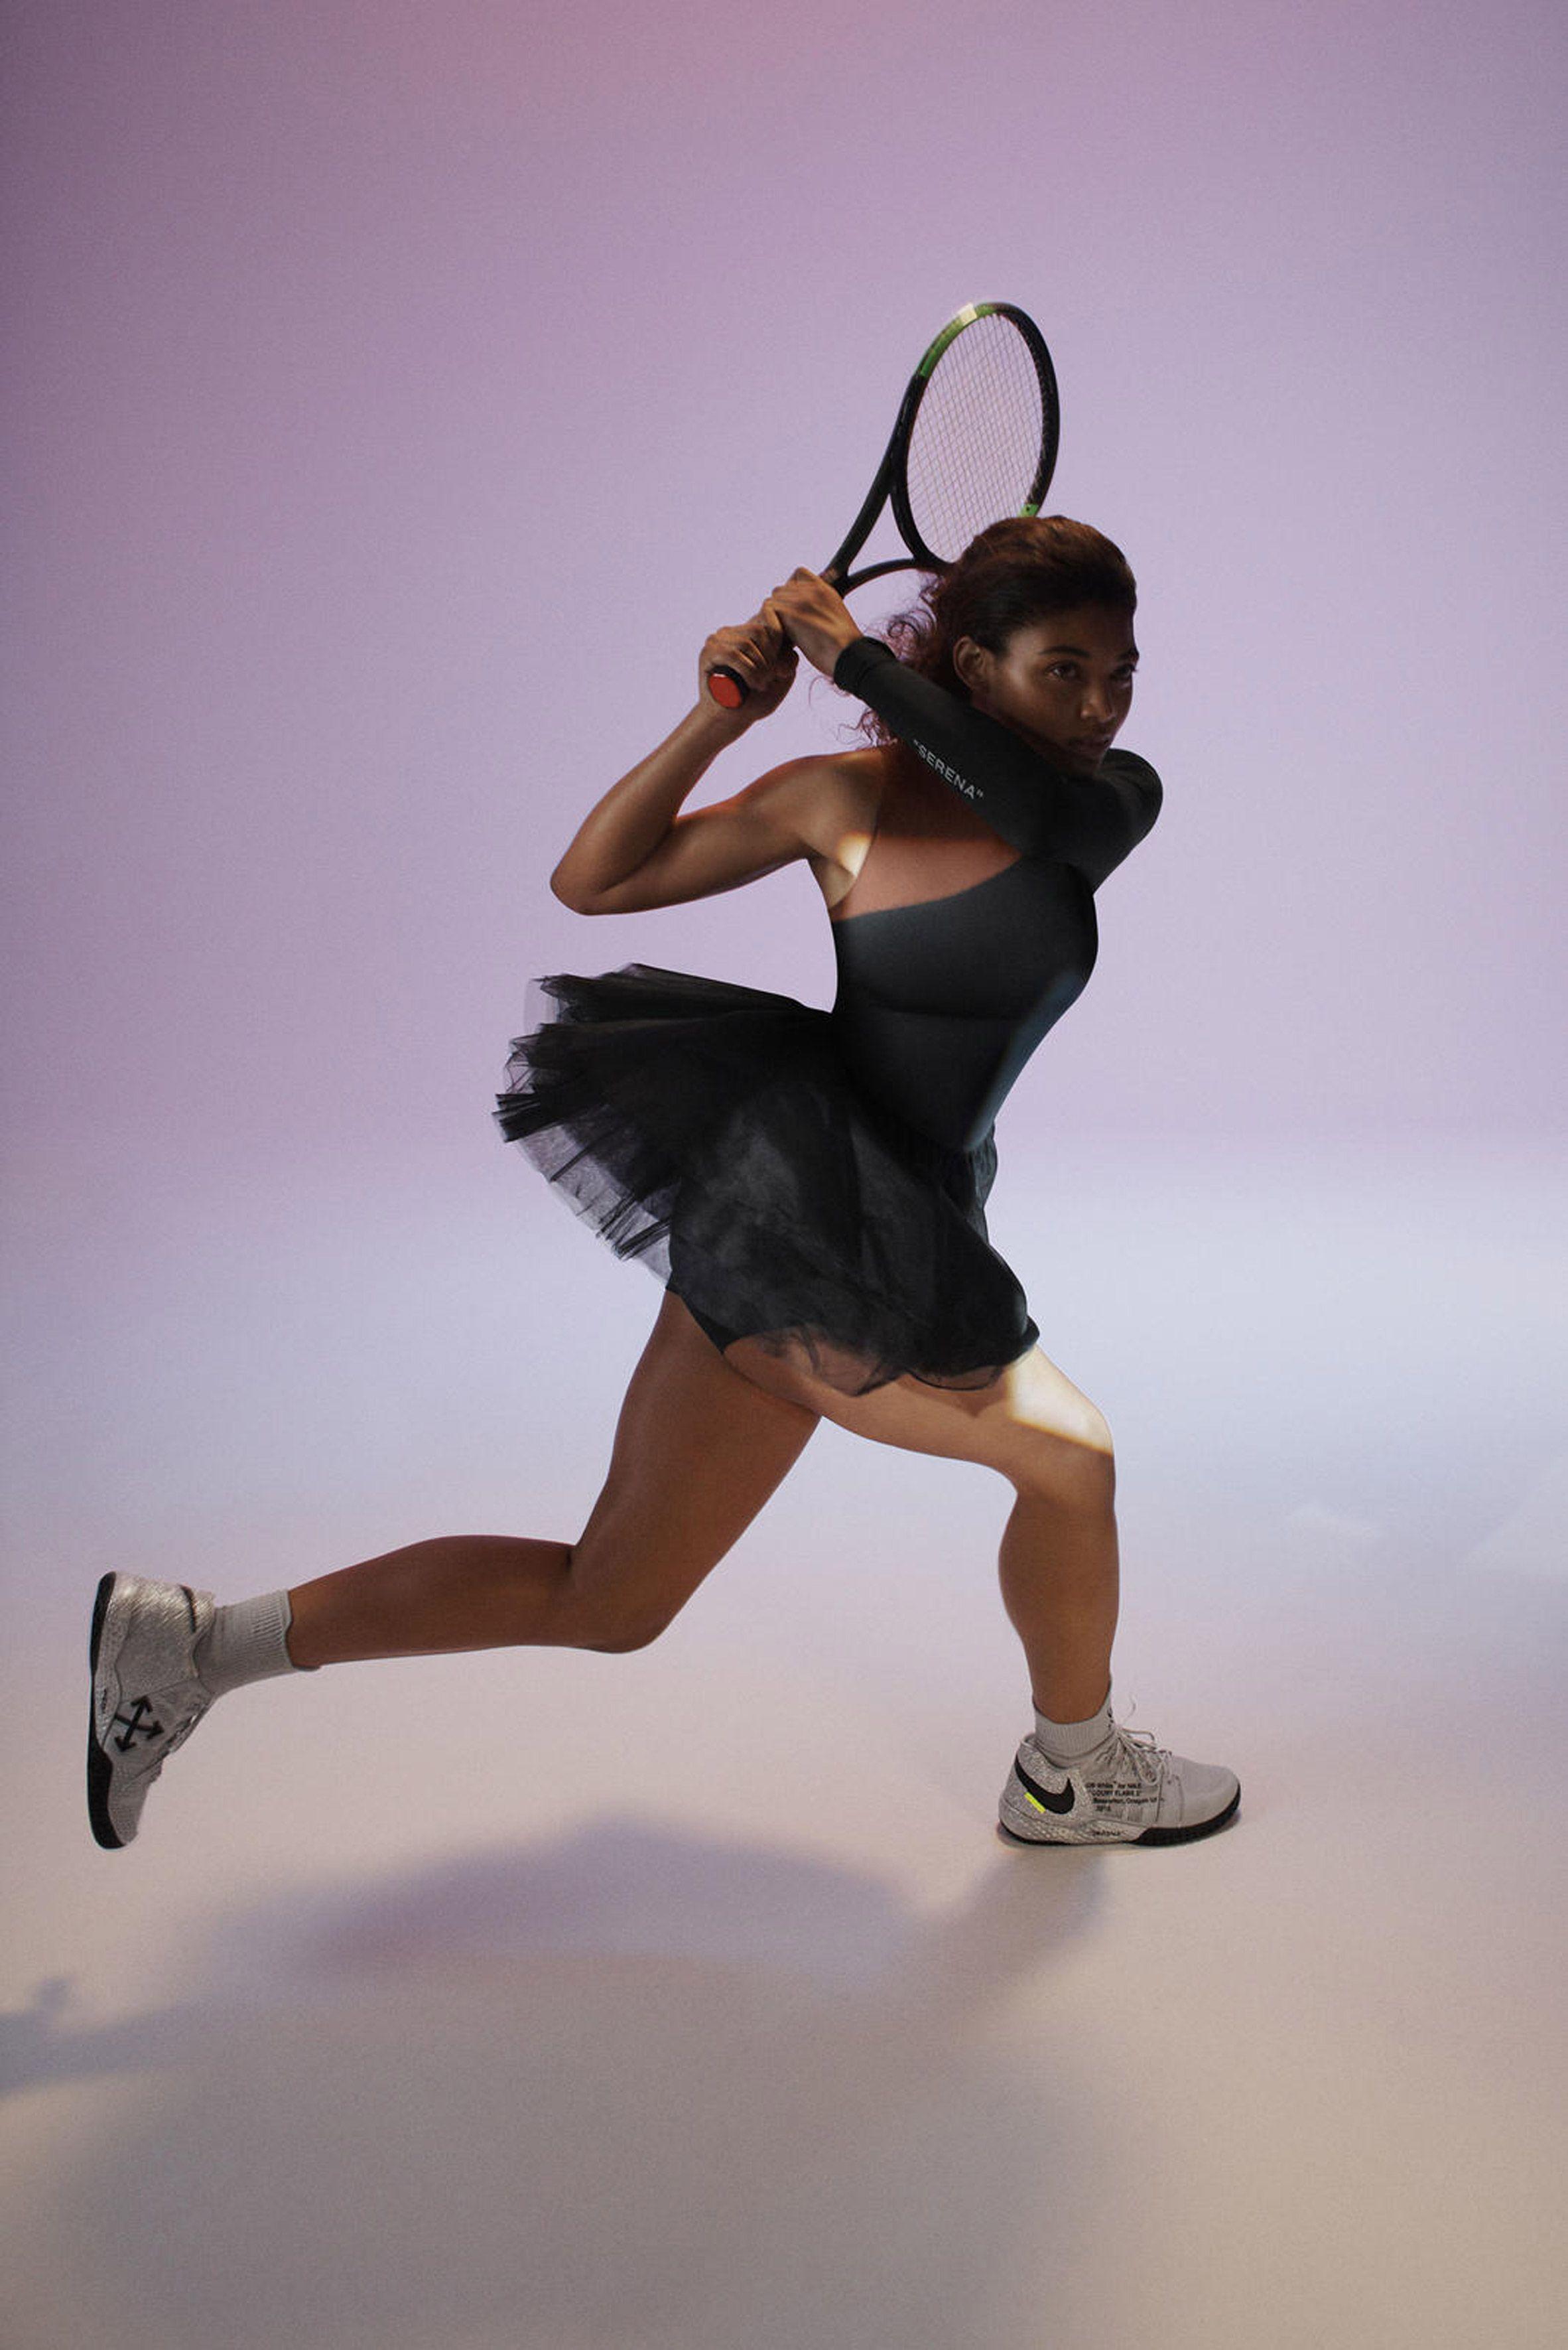 Serena Williams Wears Virgil Designed Nike Apparel | HYPEBEAST